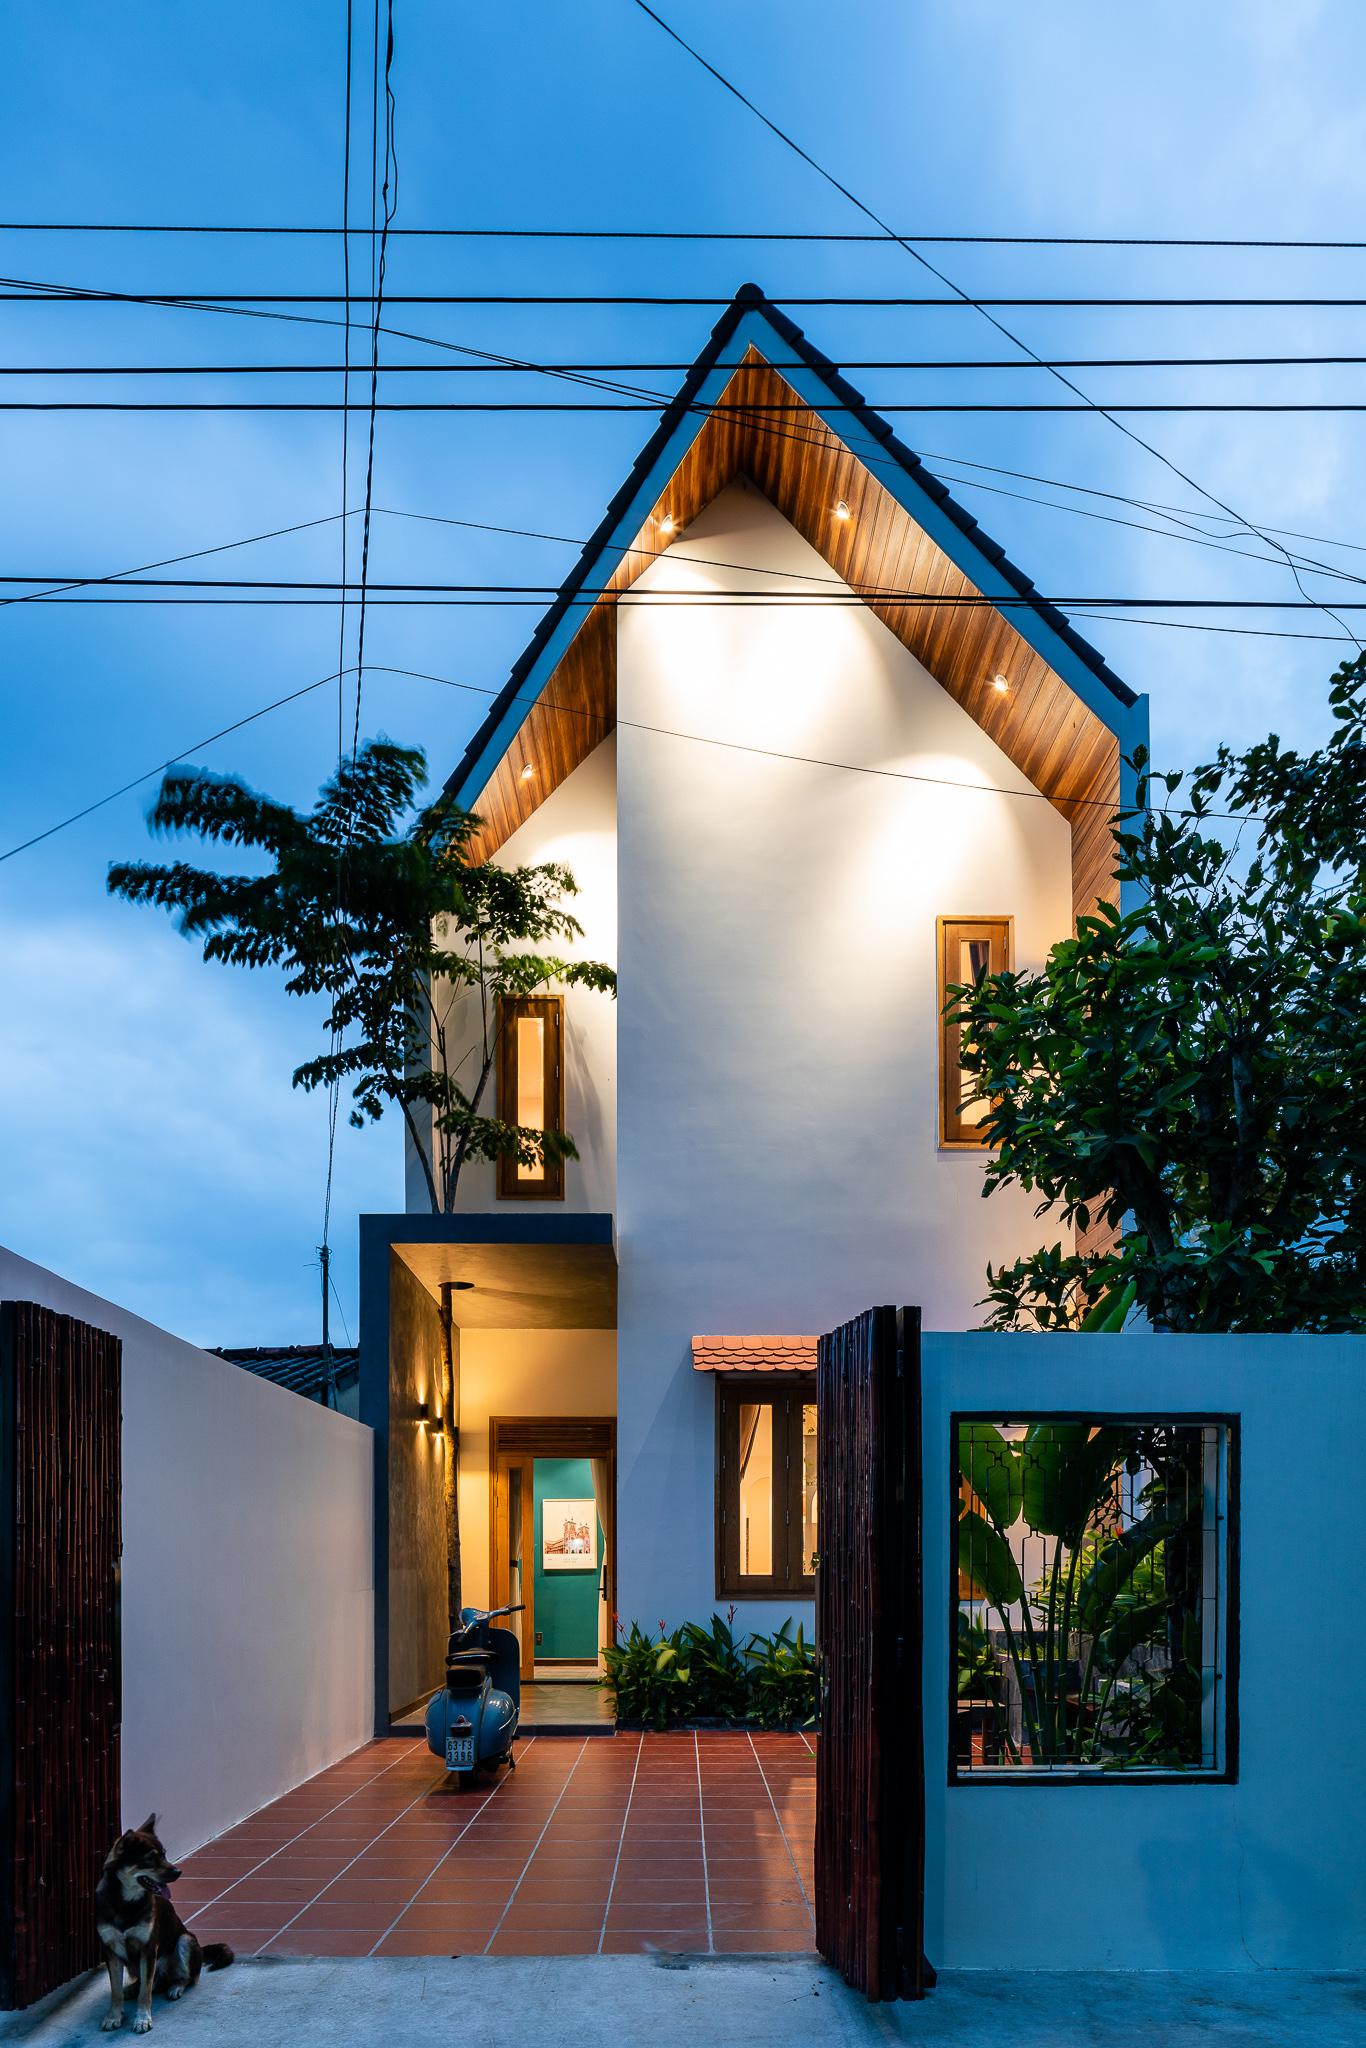 Gạo house - Nhà của Gạo | Mộc Decoration